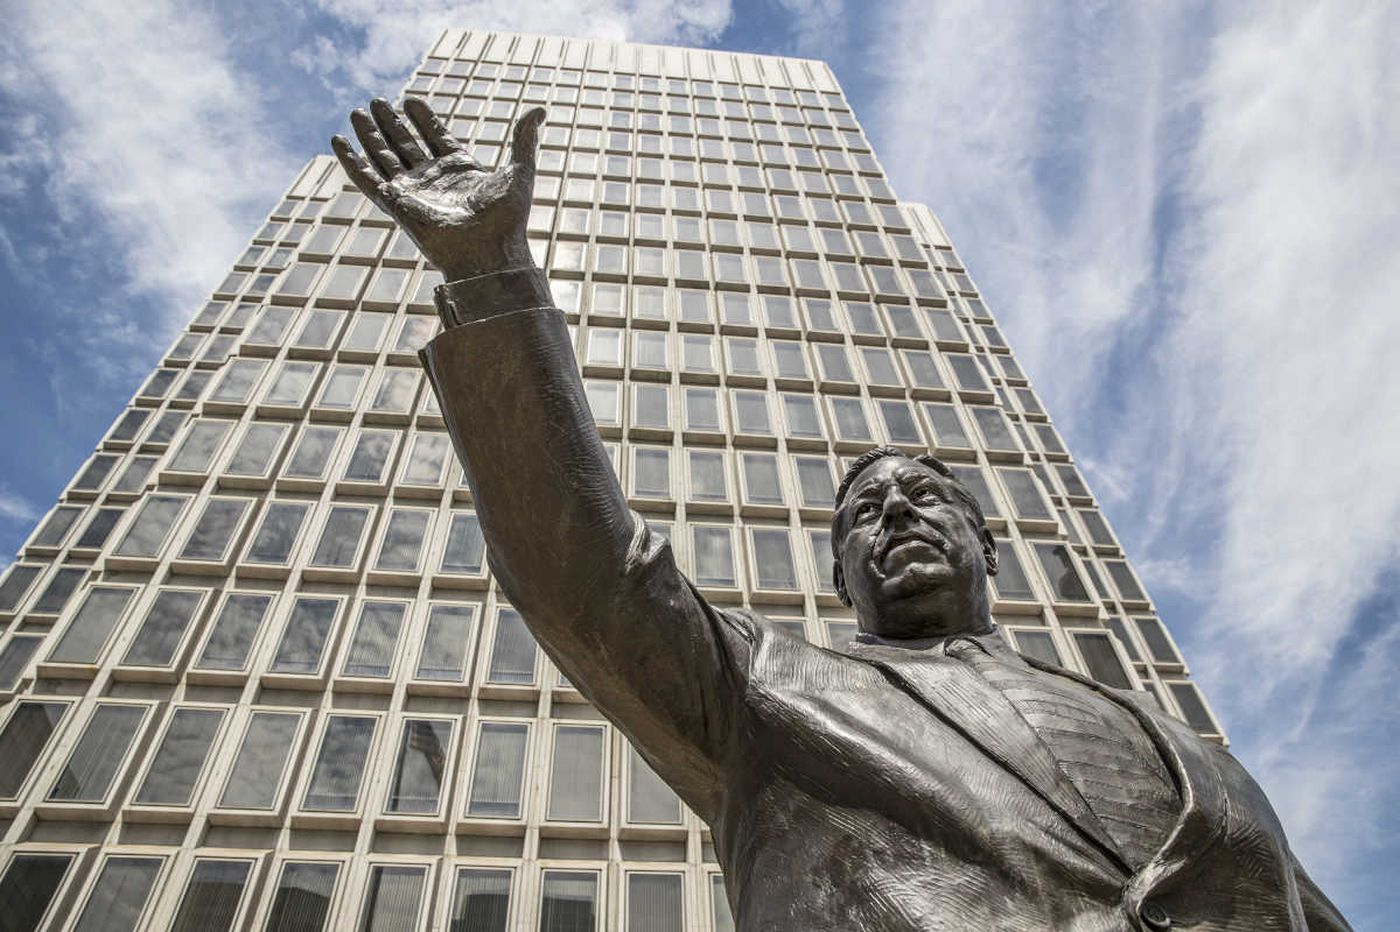 Remove the Rizzo statue from public property